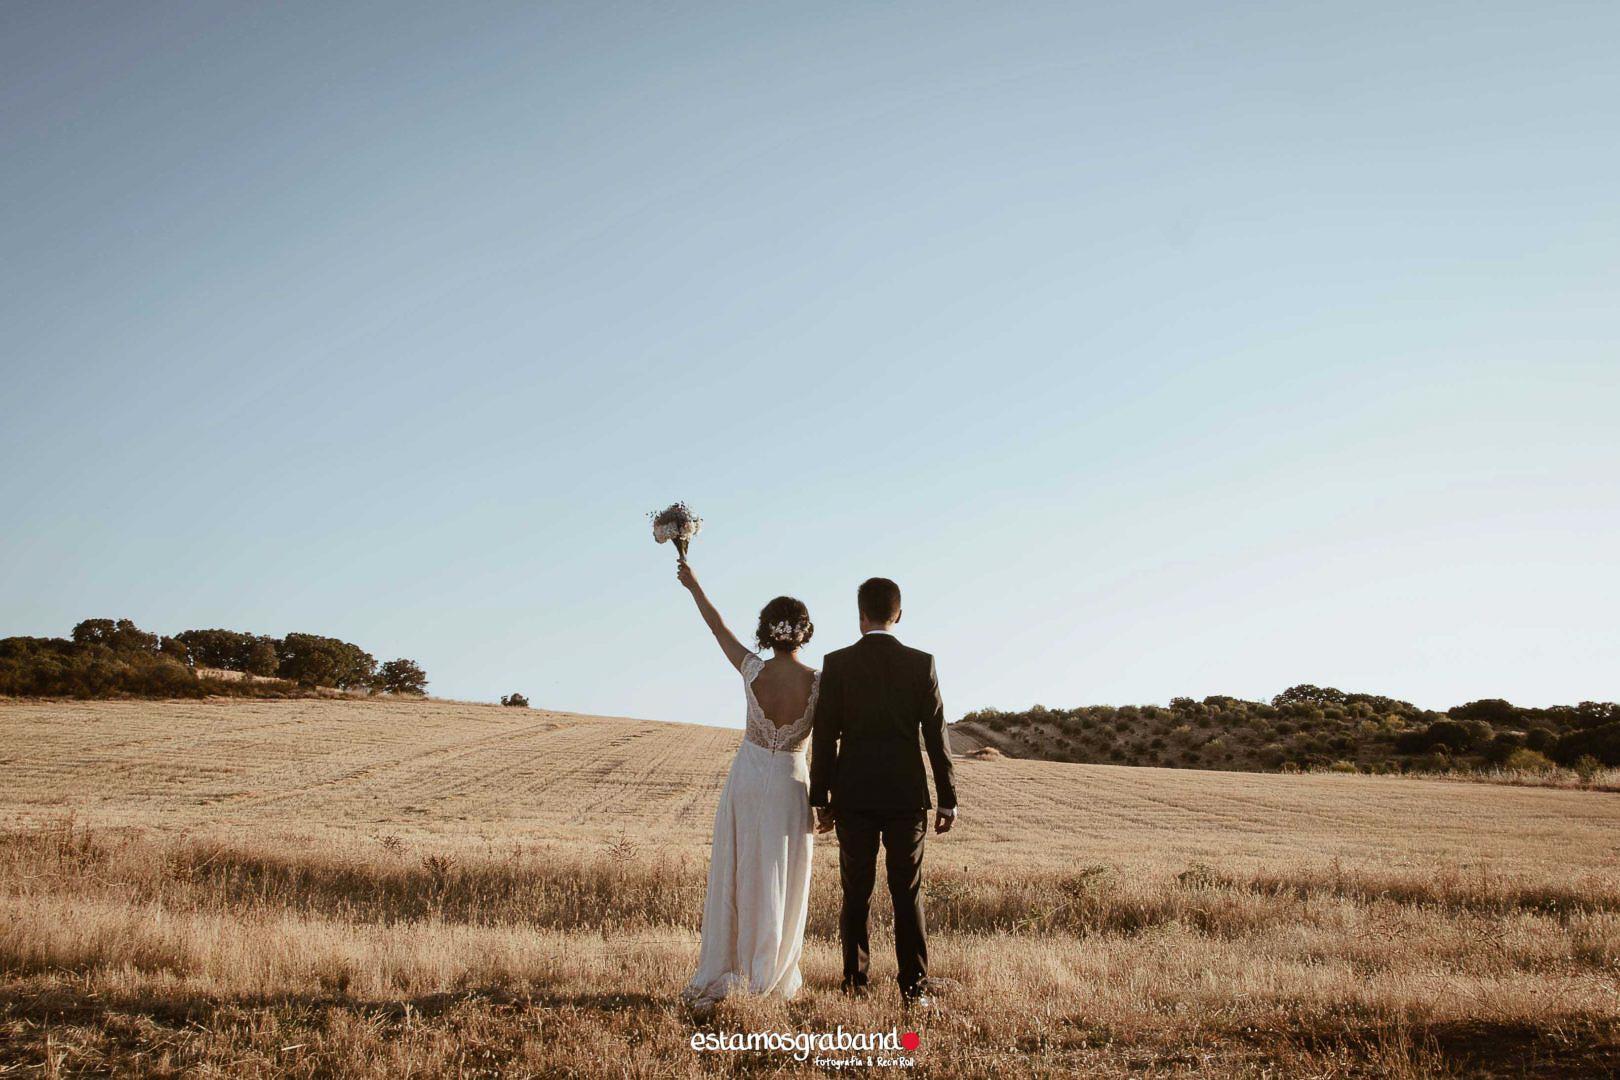 Demo-2017-Fotografía-de-Boda-19 Fotografía de Bodas Recandroller - video boda cadiz